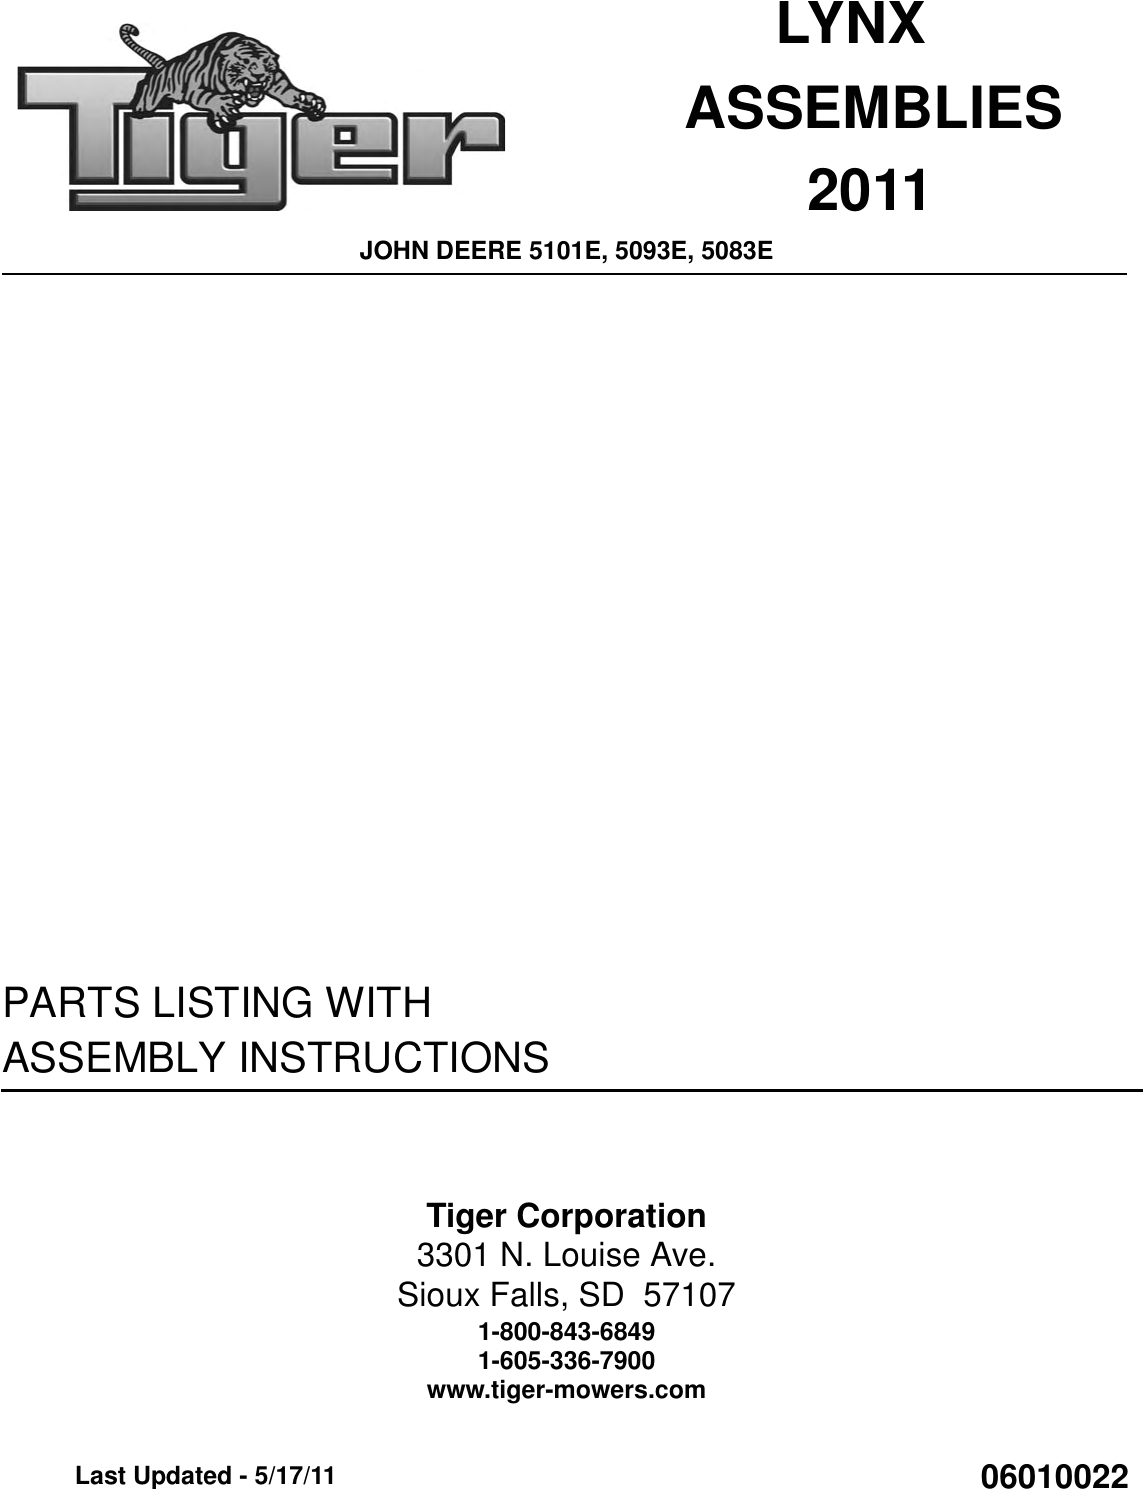 tigerproductscoltdjohndeere5083eusersmanual486106 695469319 user guide page 1 png